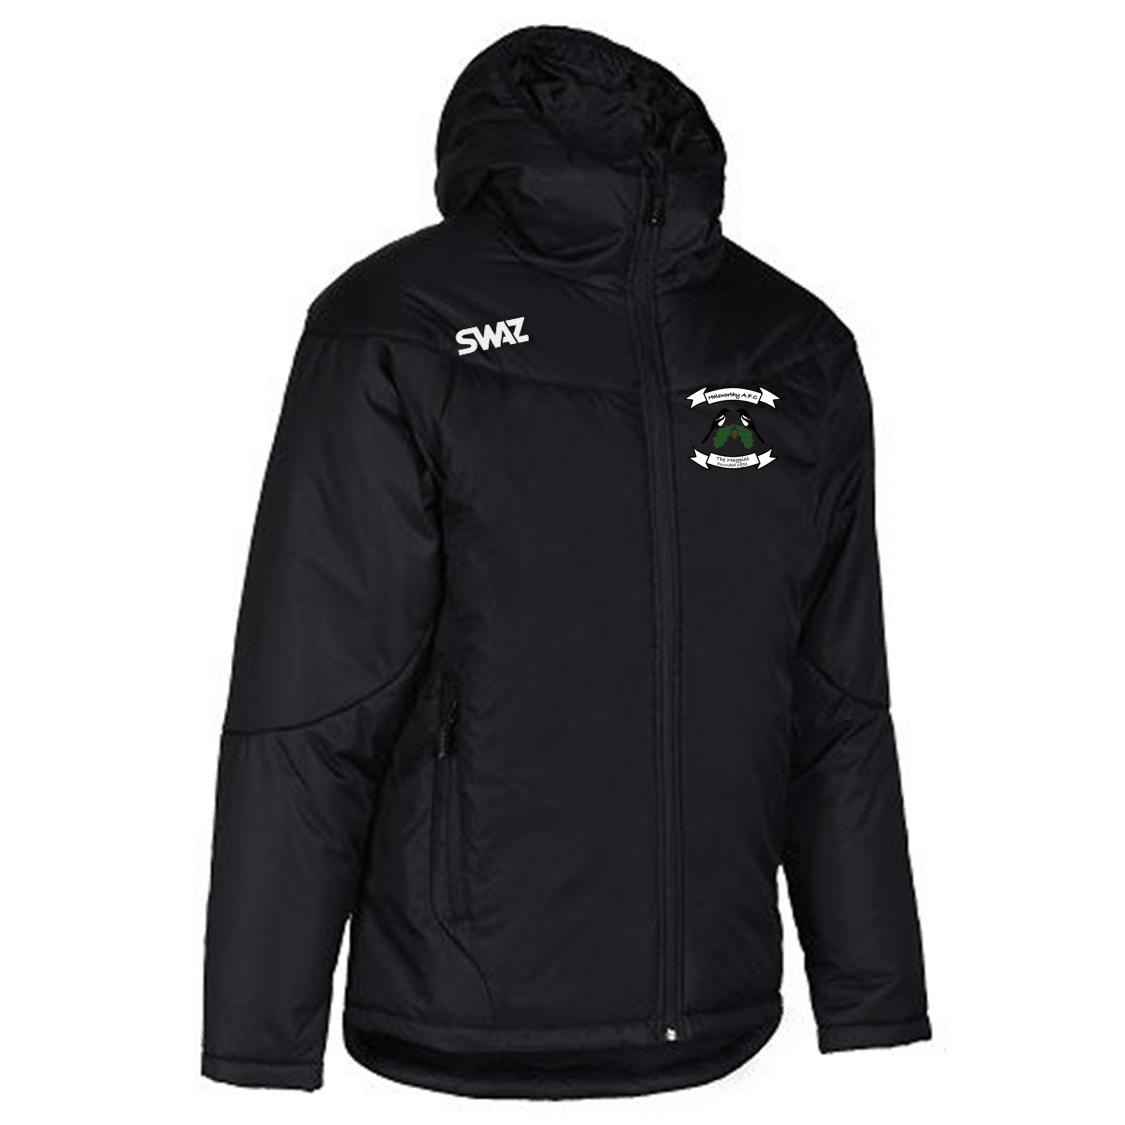 Holsworthy AFC Manager's Jacket | SWAZ | Football Kit Supplier